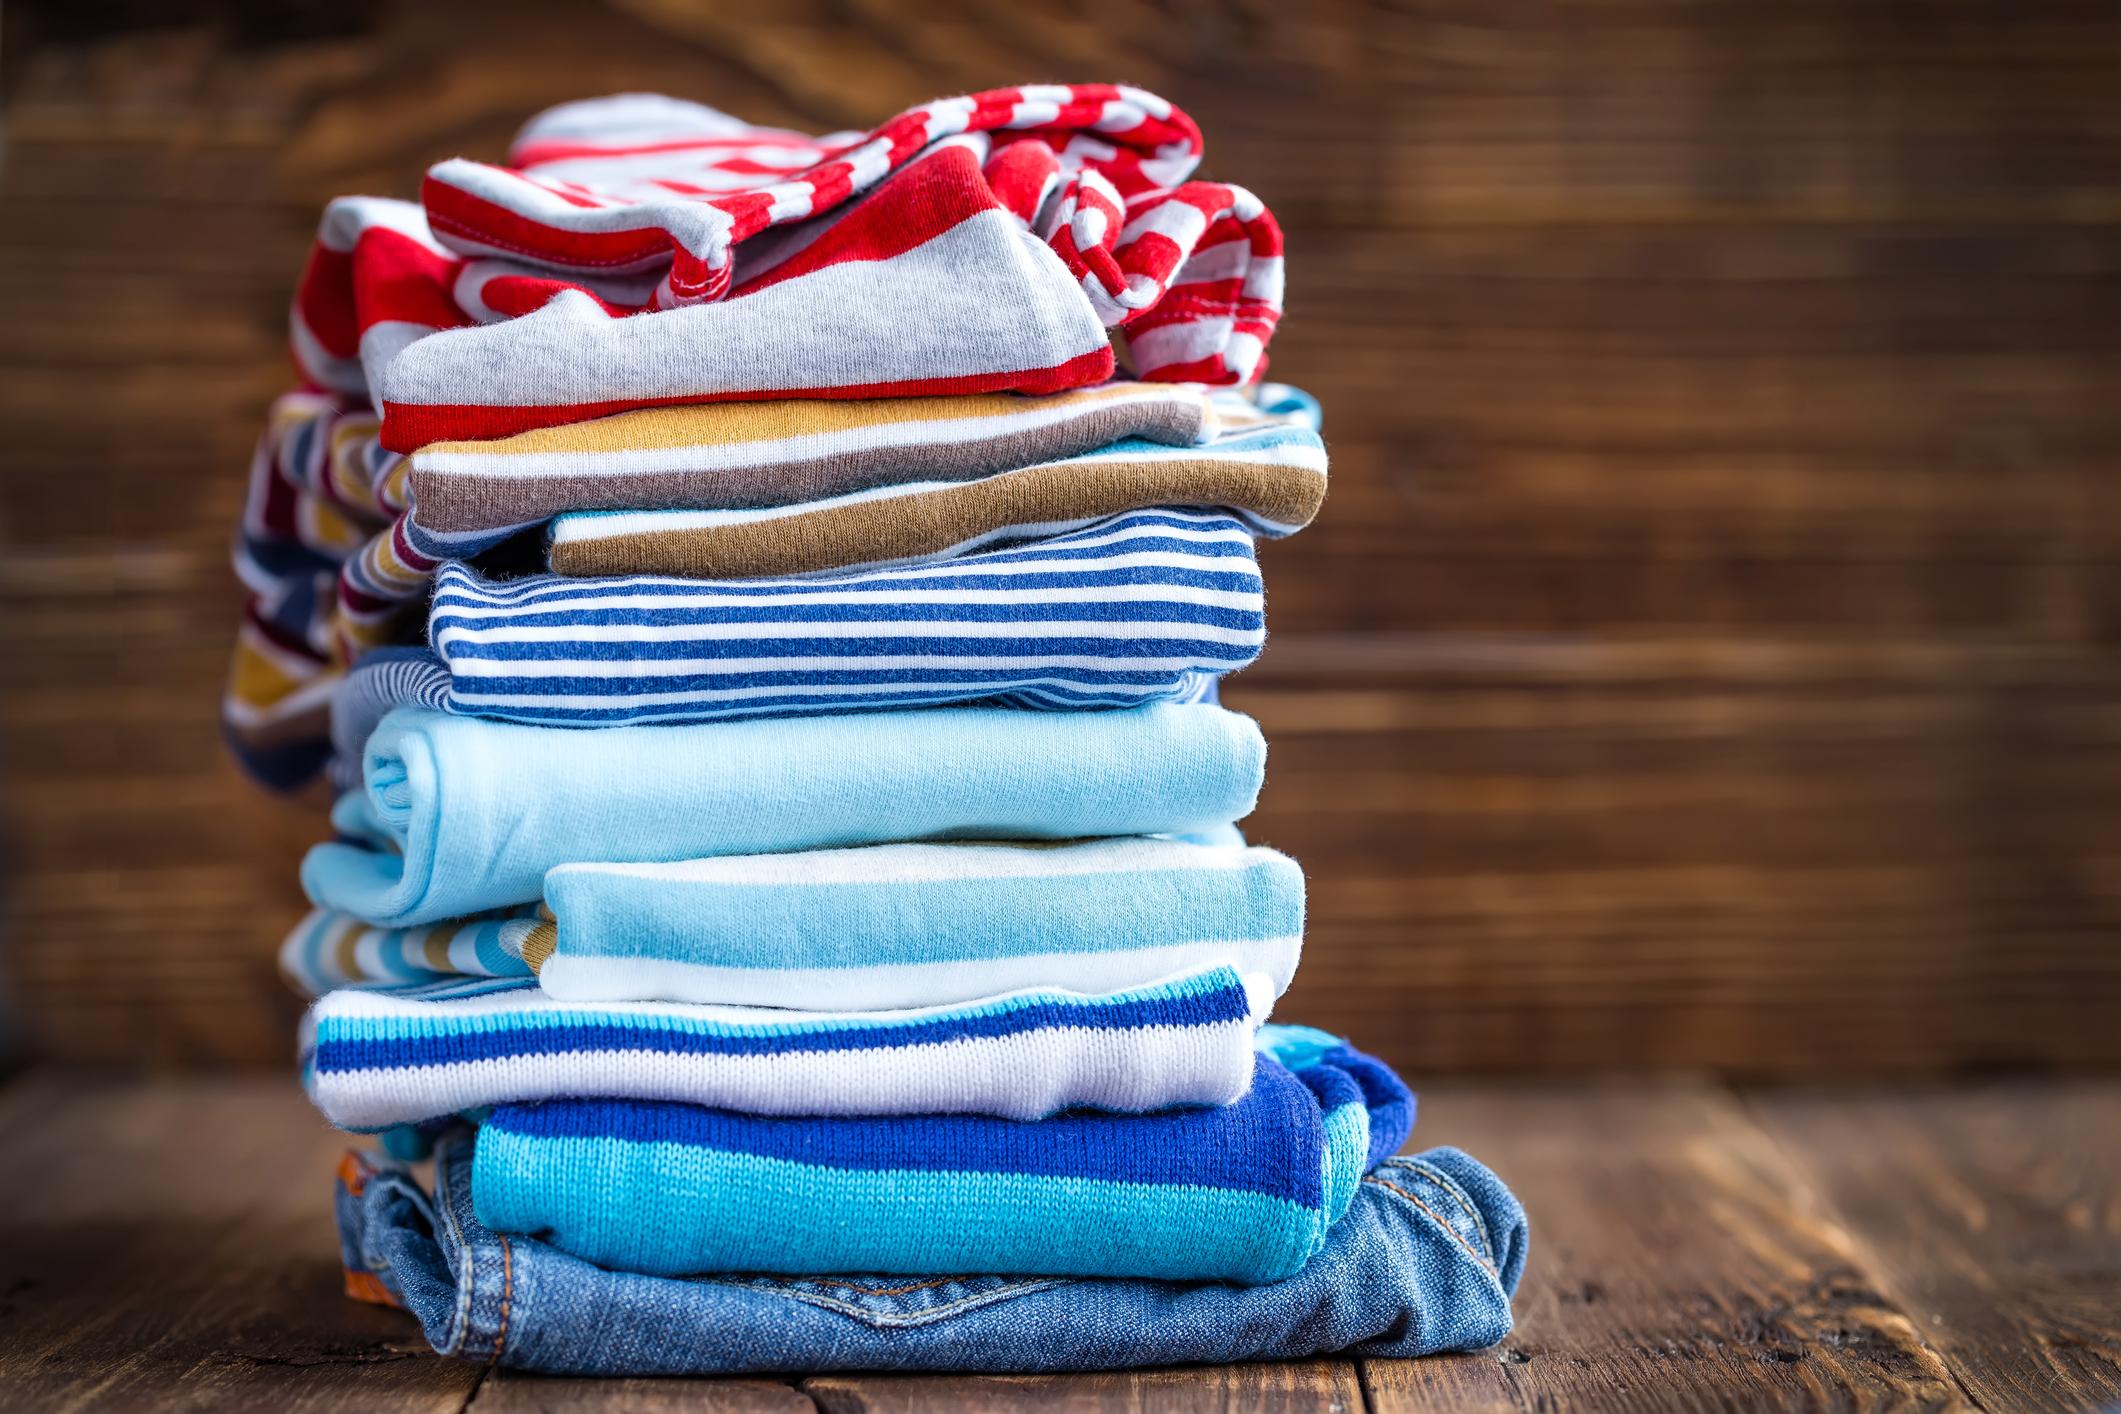 Stack of folded children's clothing